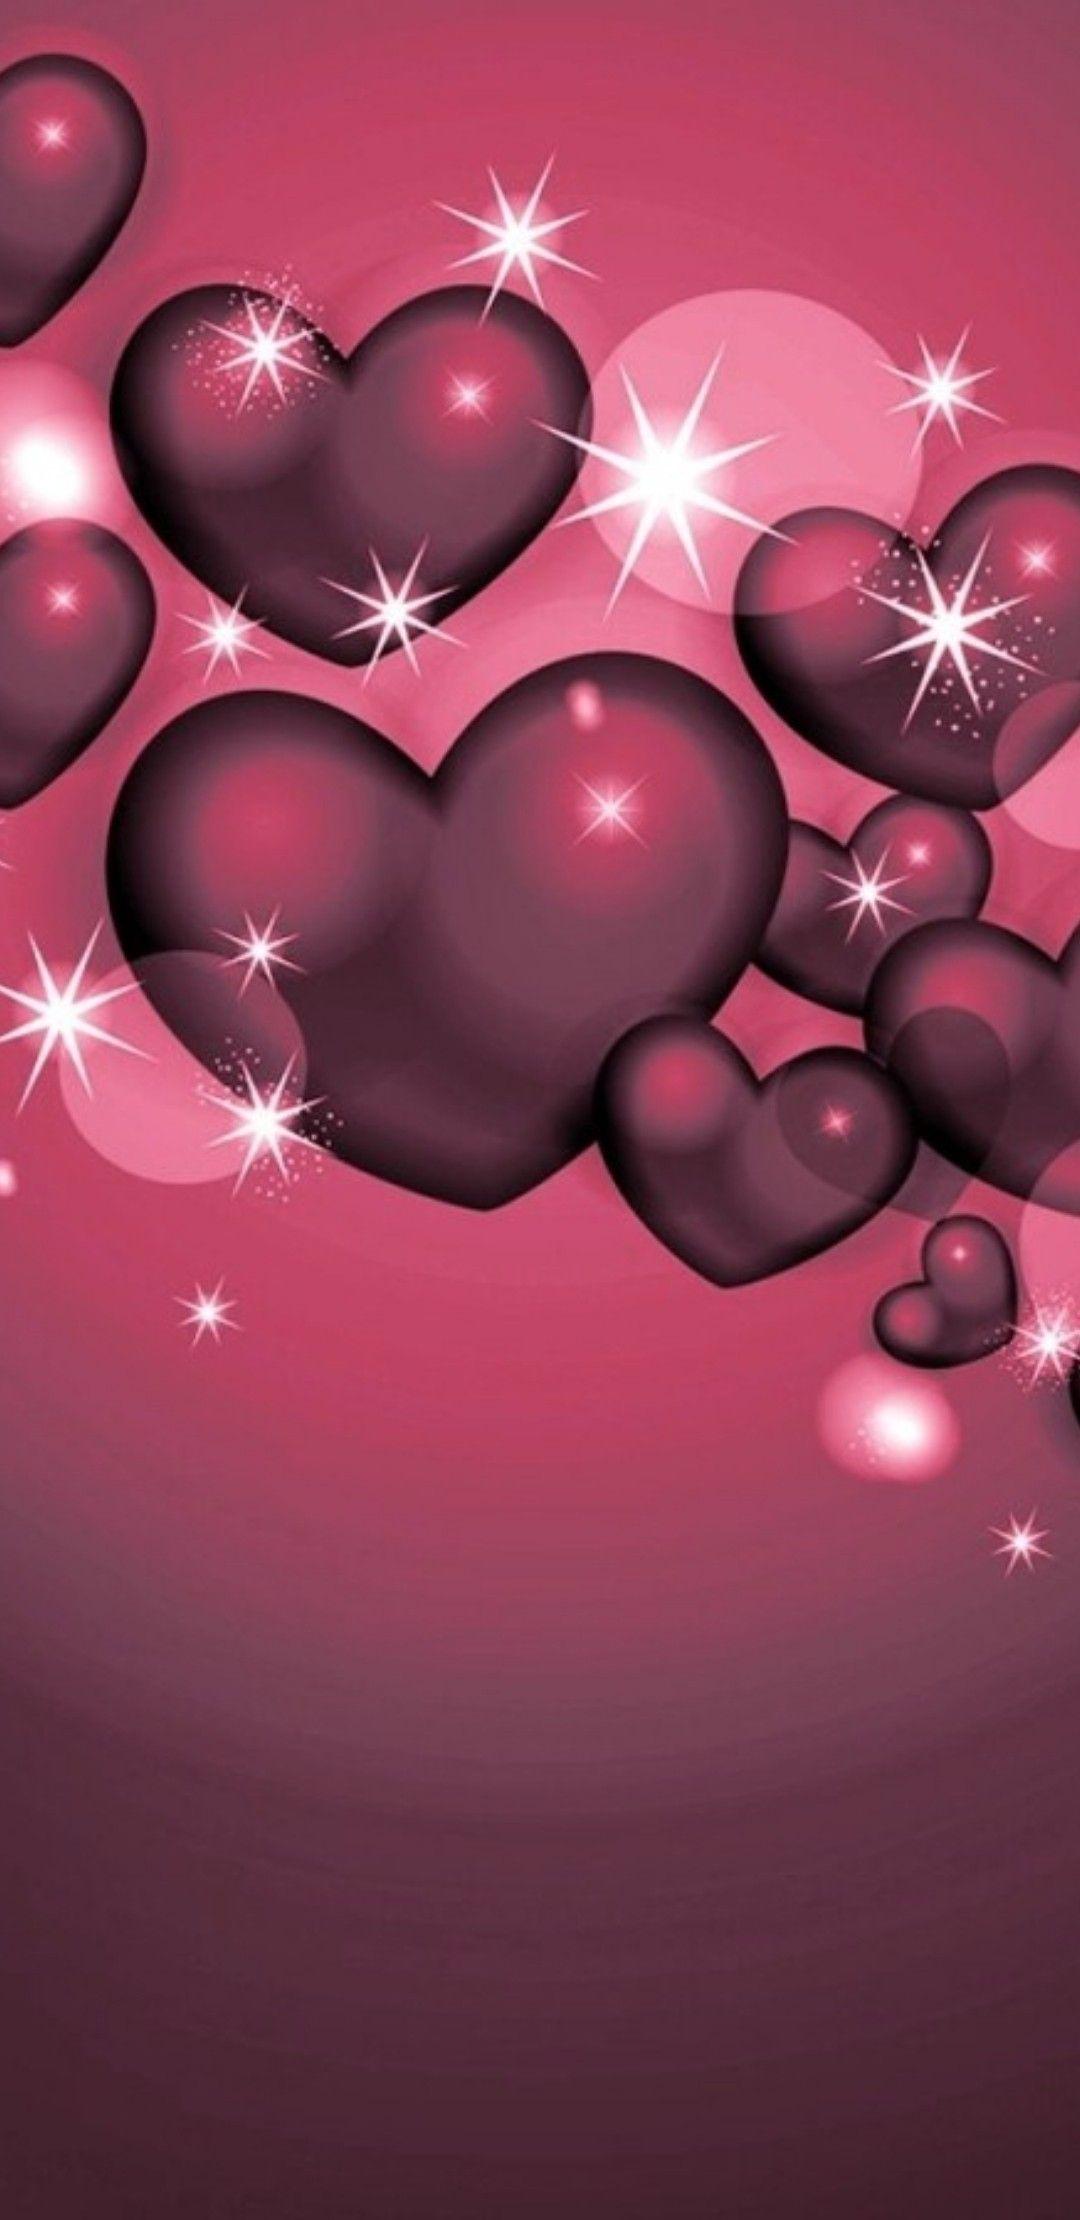 Michelle Tuapante Archivo Locales Fundacion Carino Heart Wallpaper Valentines Wallpaper Butterfly Wallpaper Iphone